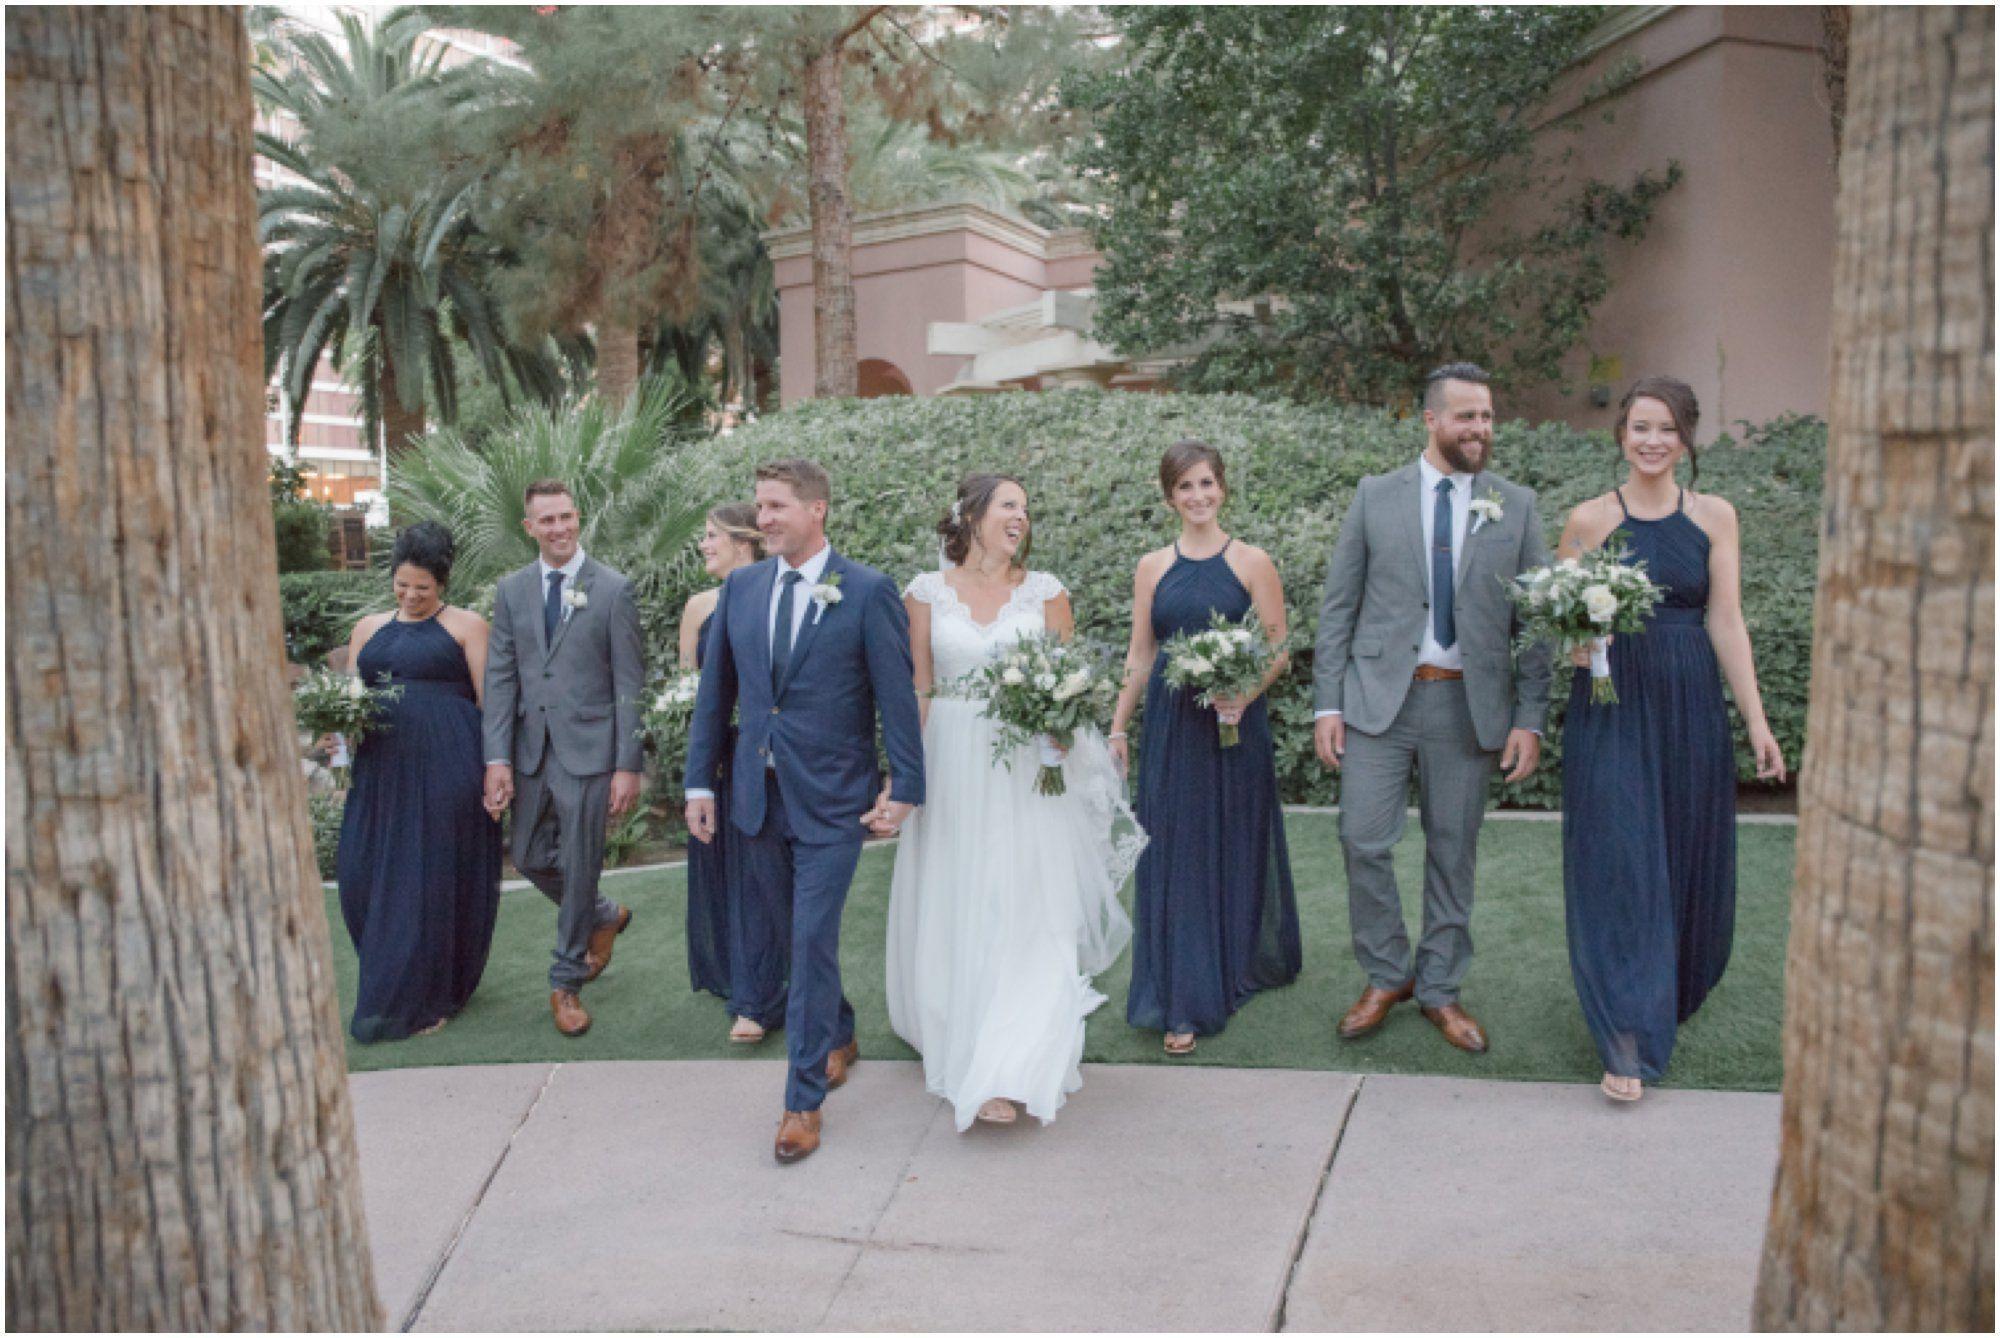 The Flamingo Hotel Casino Las Vegas Nevada Flamingo Hotel Casino Wedding Flami Las Vegas Wedding Venue Vegas Wedding Venue Outdoor Las Vegas Wedding